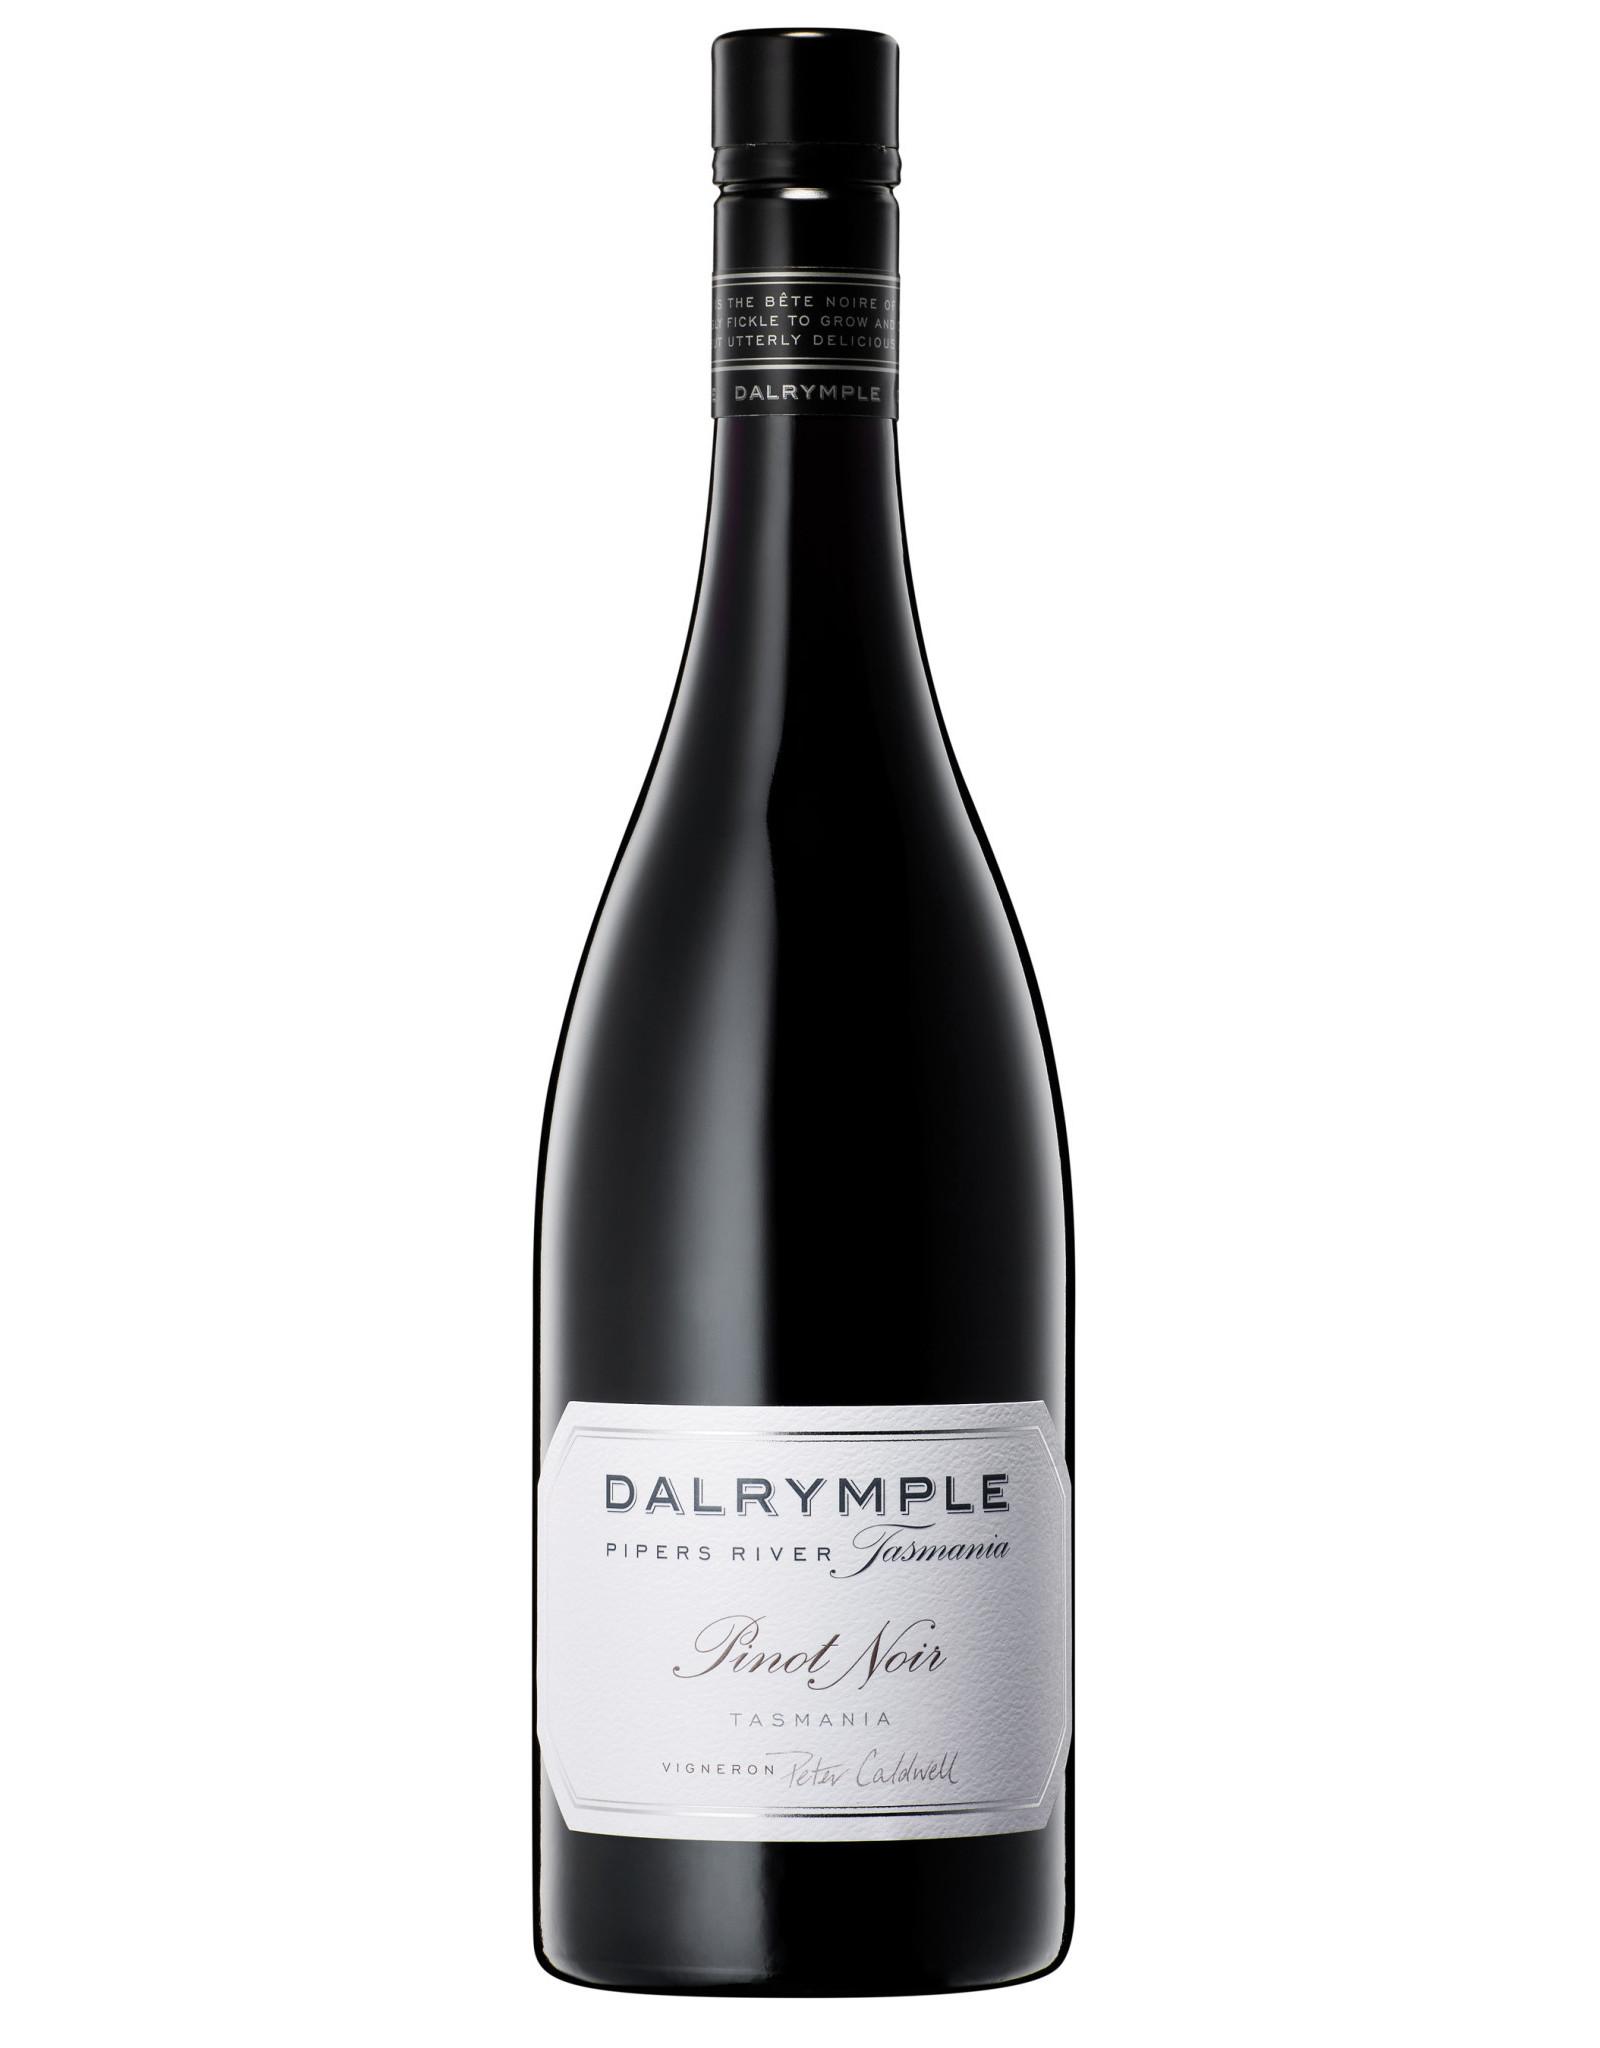 Dalrymple Pinot Noir 2014